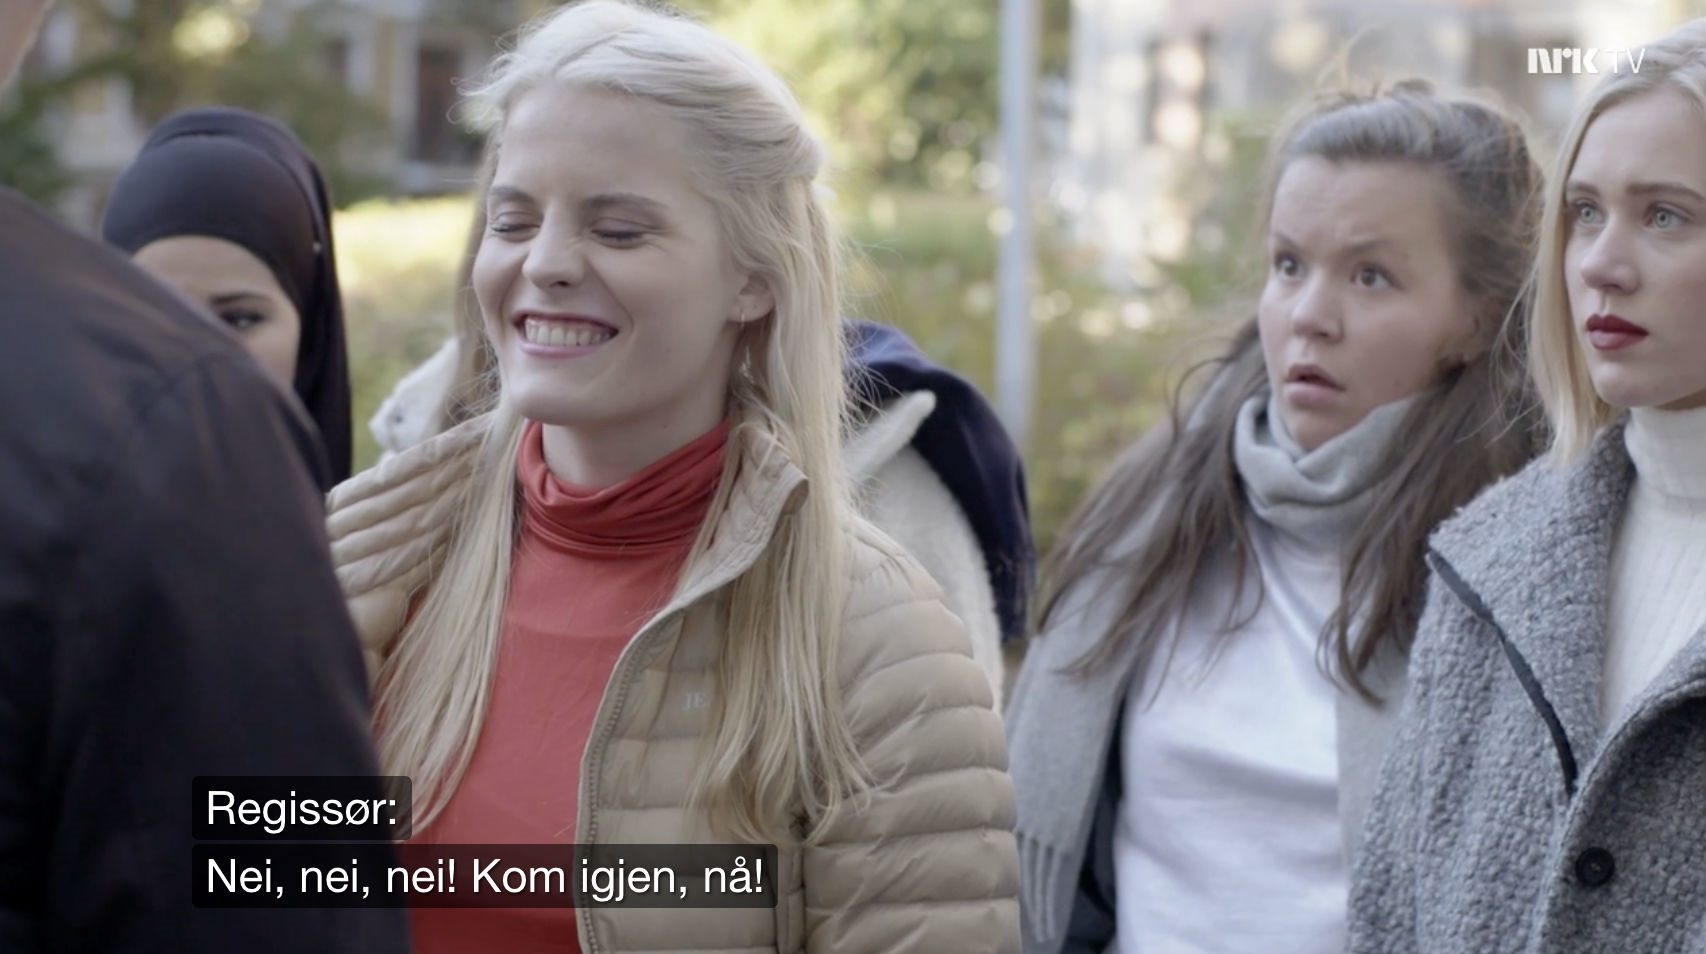 VI SAVNER DERE (NRK)